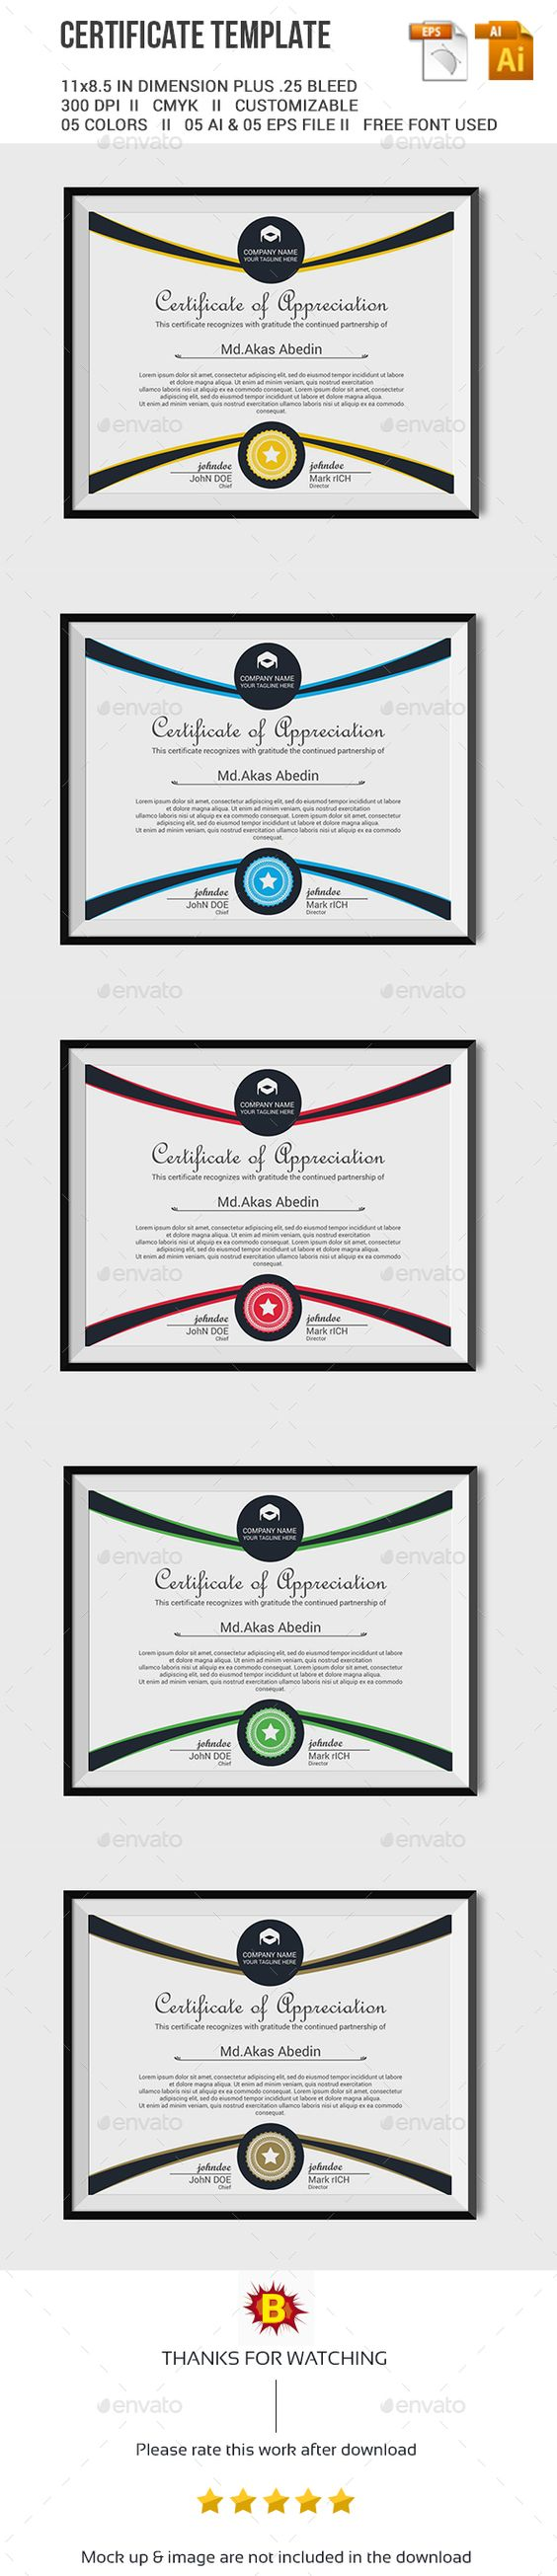 Blank Certificates Templates Free Download Kadir Khan Justkadir On Pinterest